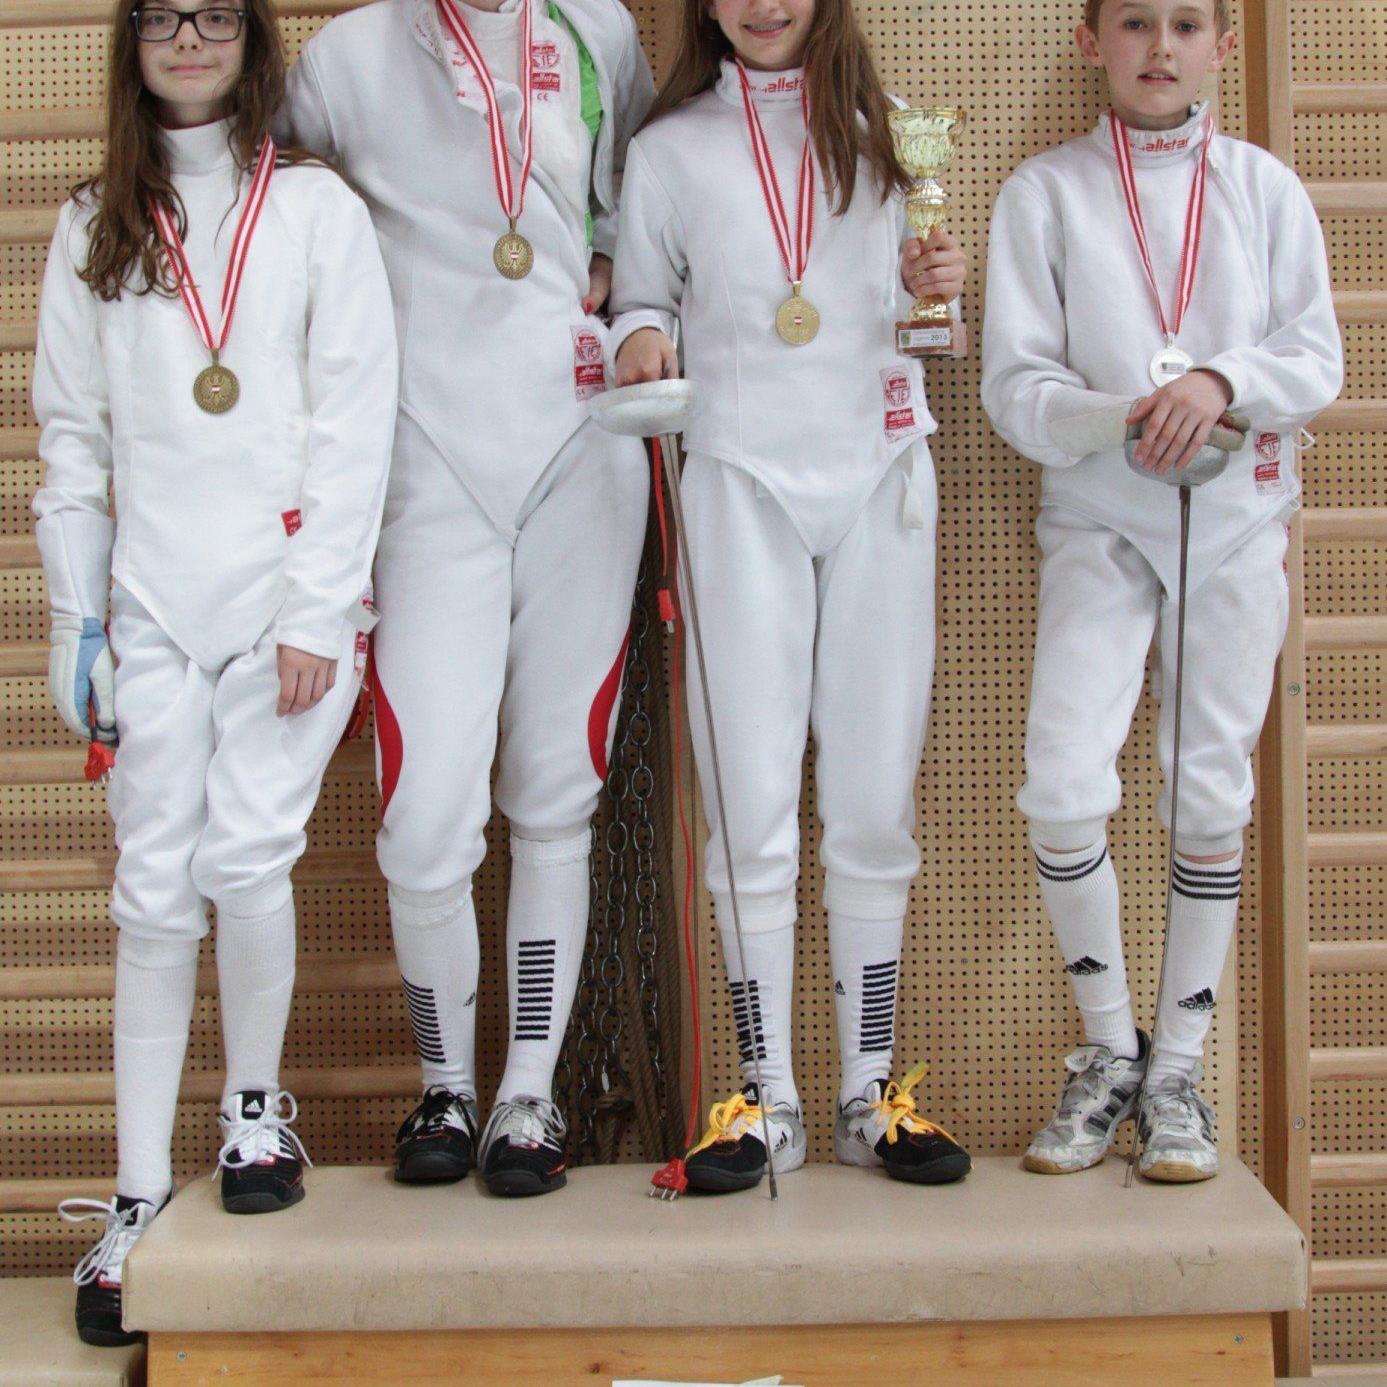 vlnr: Jeannine Terzer, Julia Monschein, Antonia Grabher, Samuel Berktold